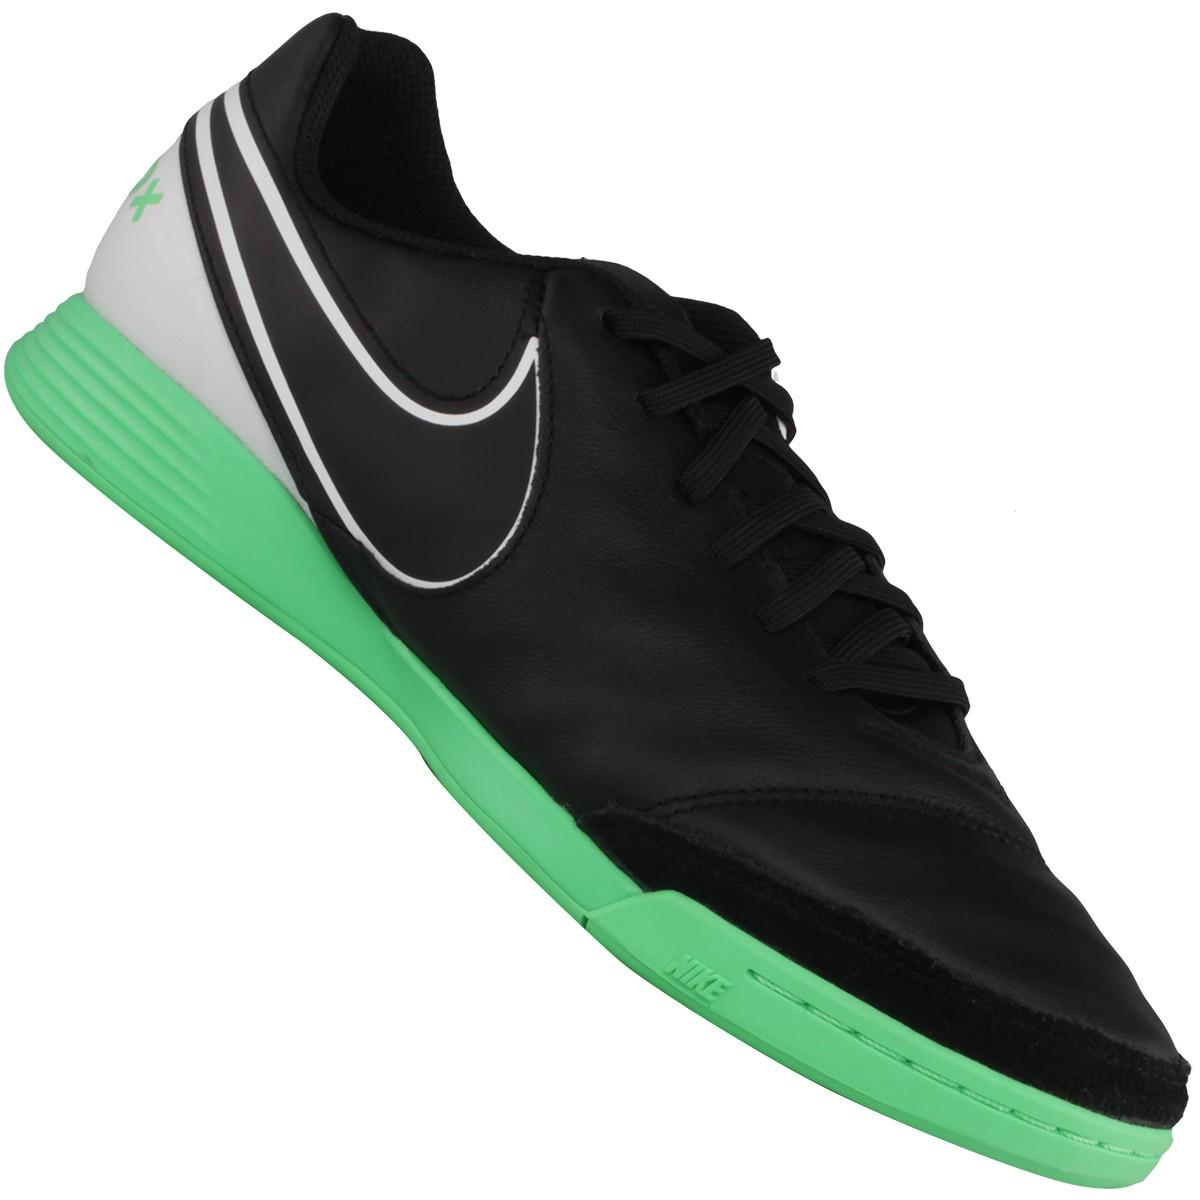 brand new 75e32 b2205 Tênis Nike Tiempo Gênio 2 Leather Ic Futsal